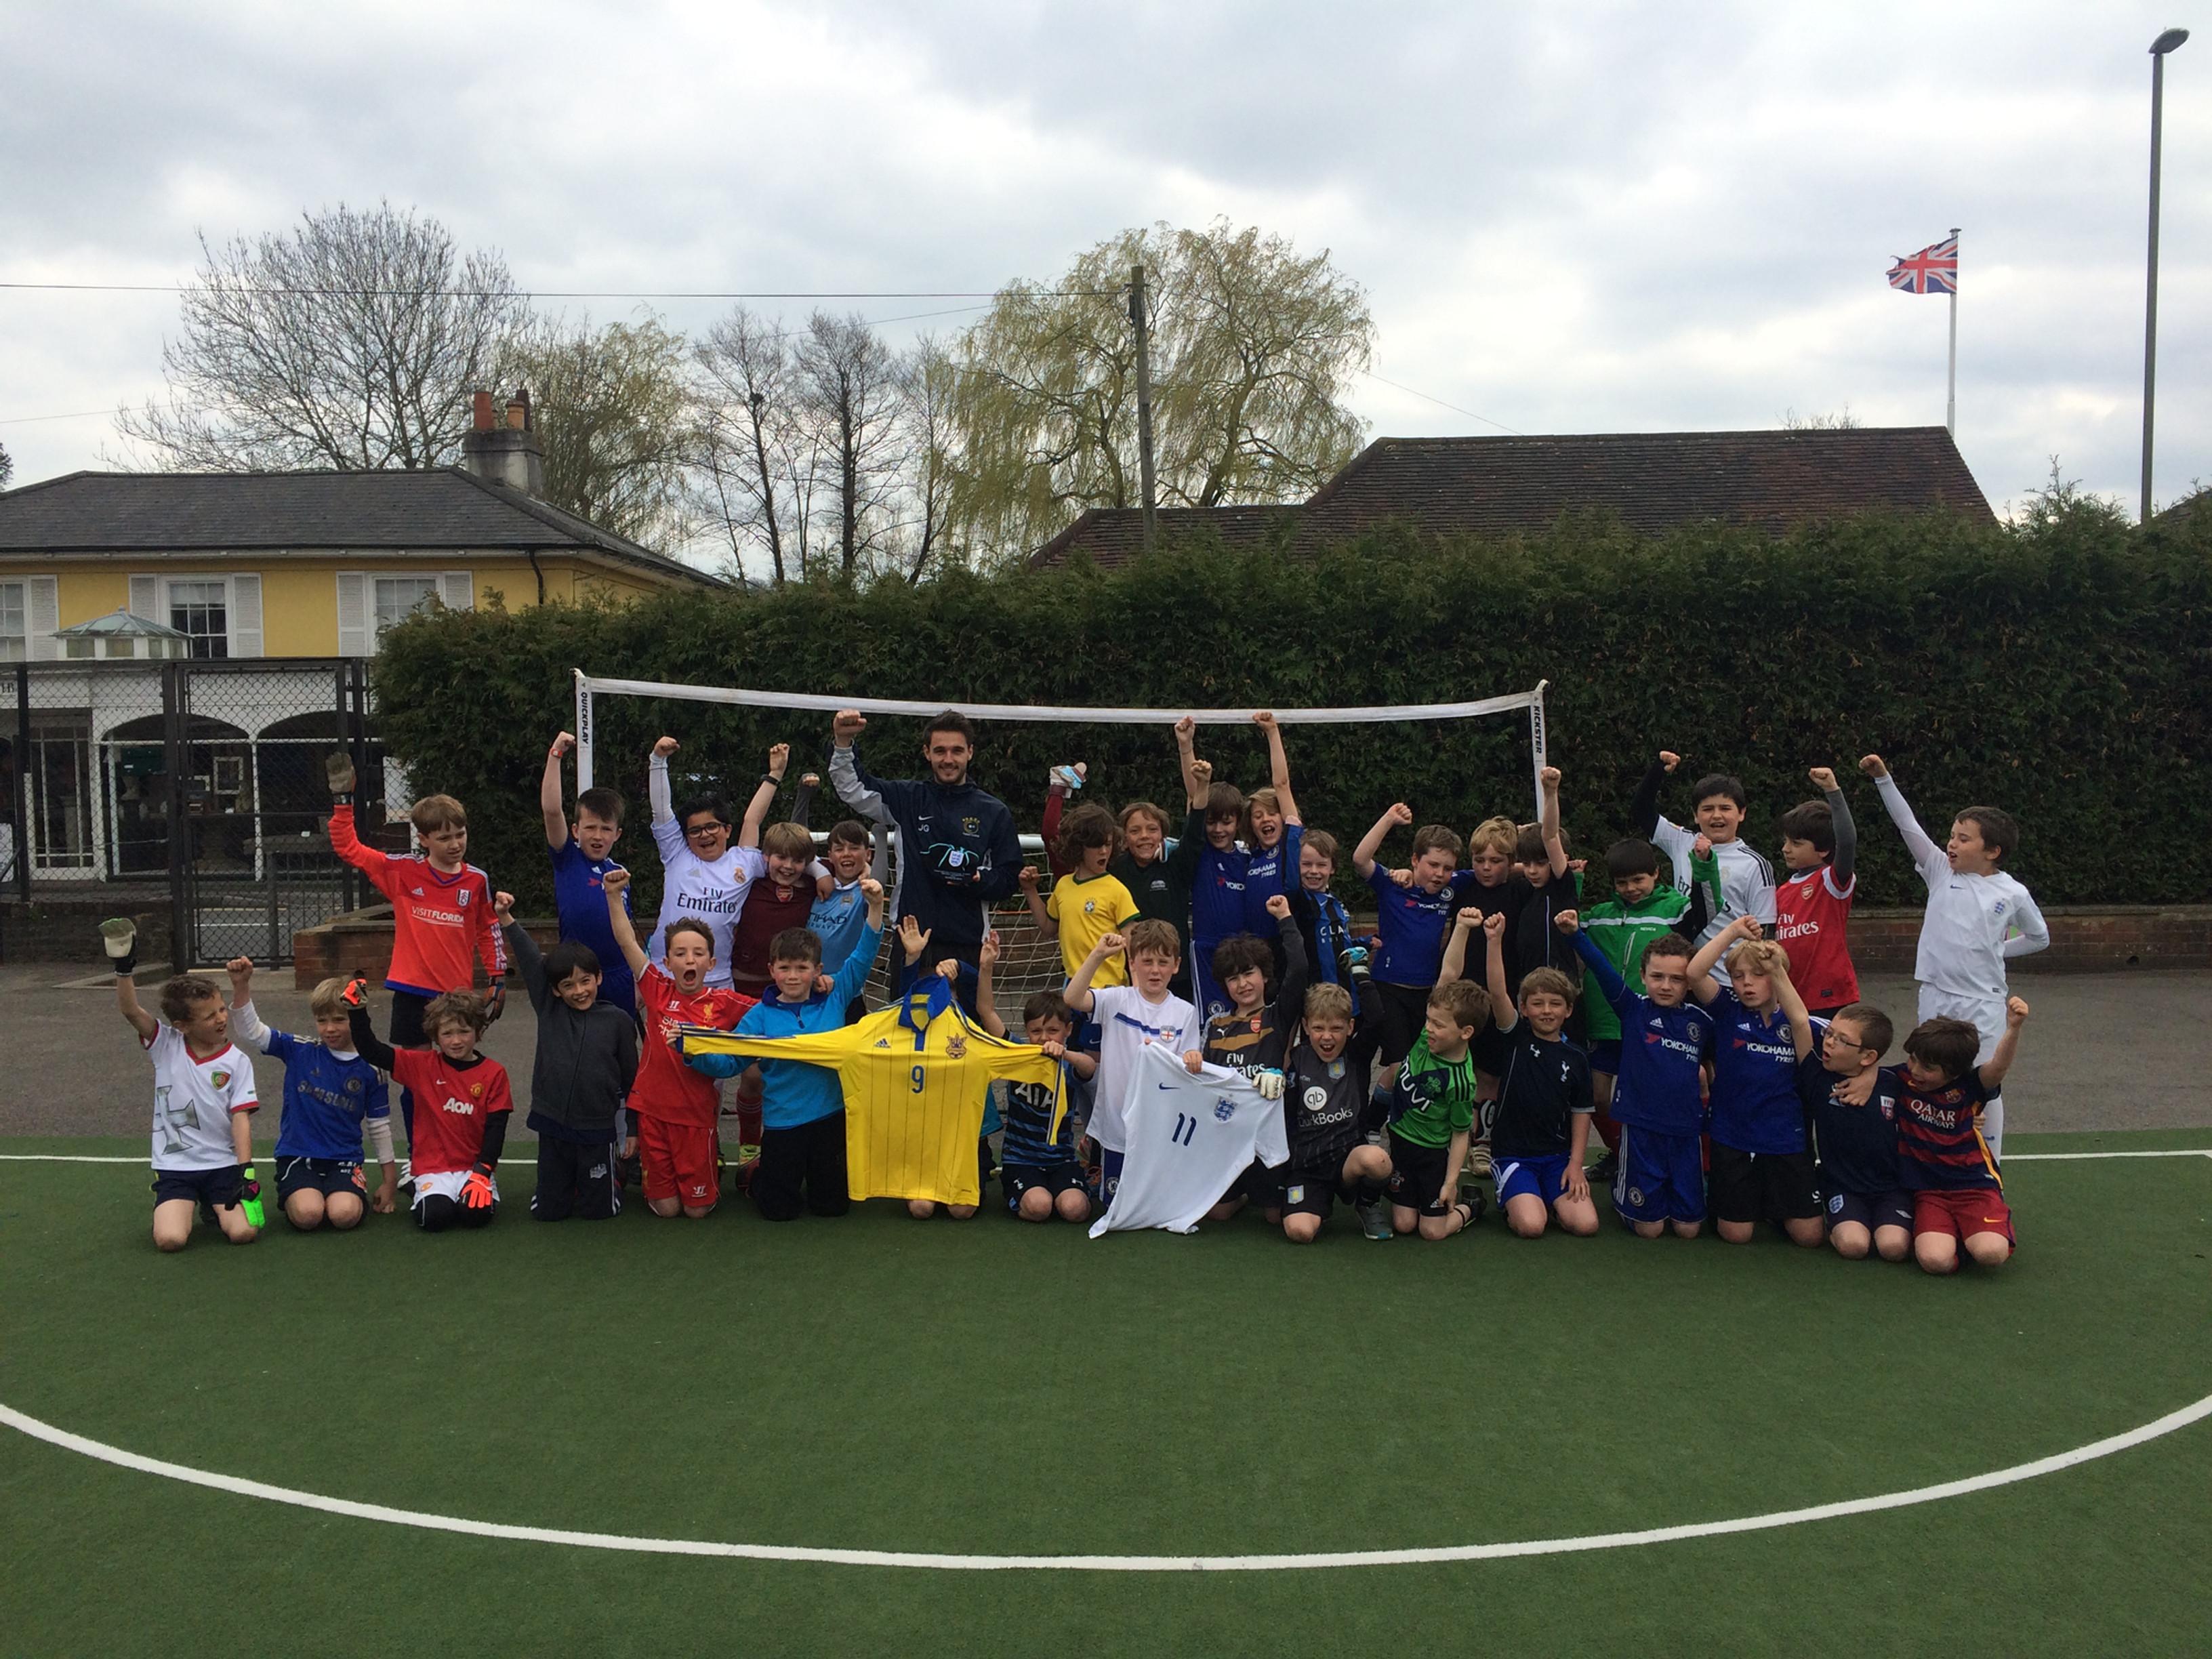 North Farnborough Infants - Multi Sports